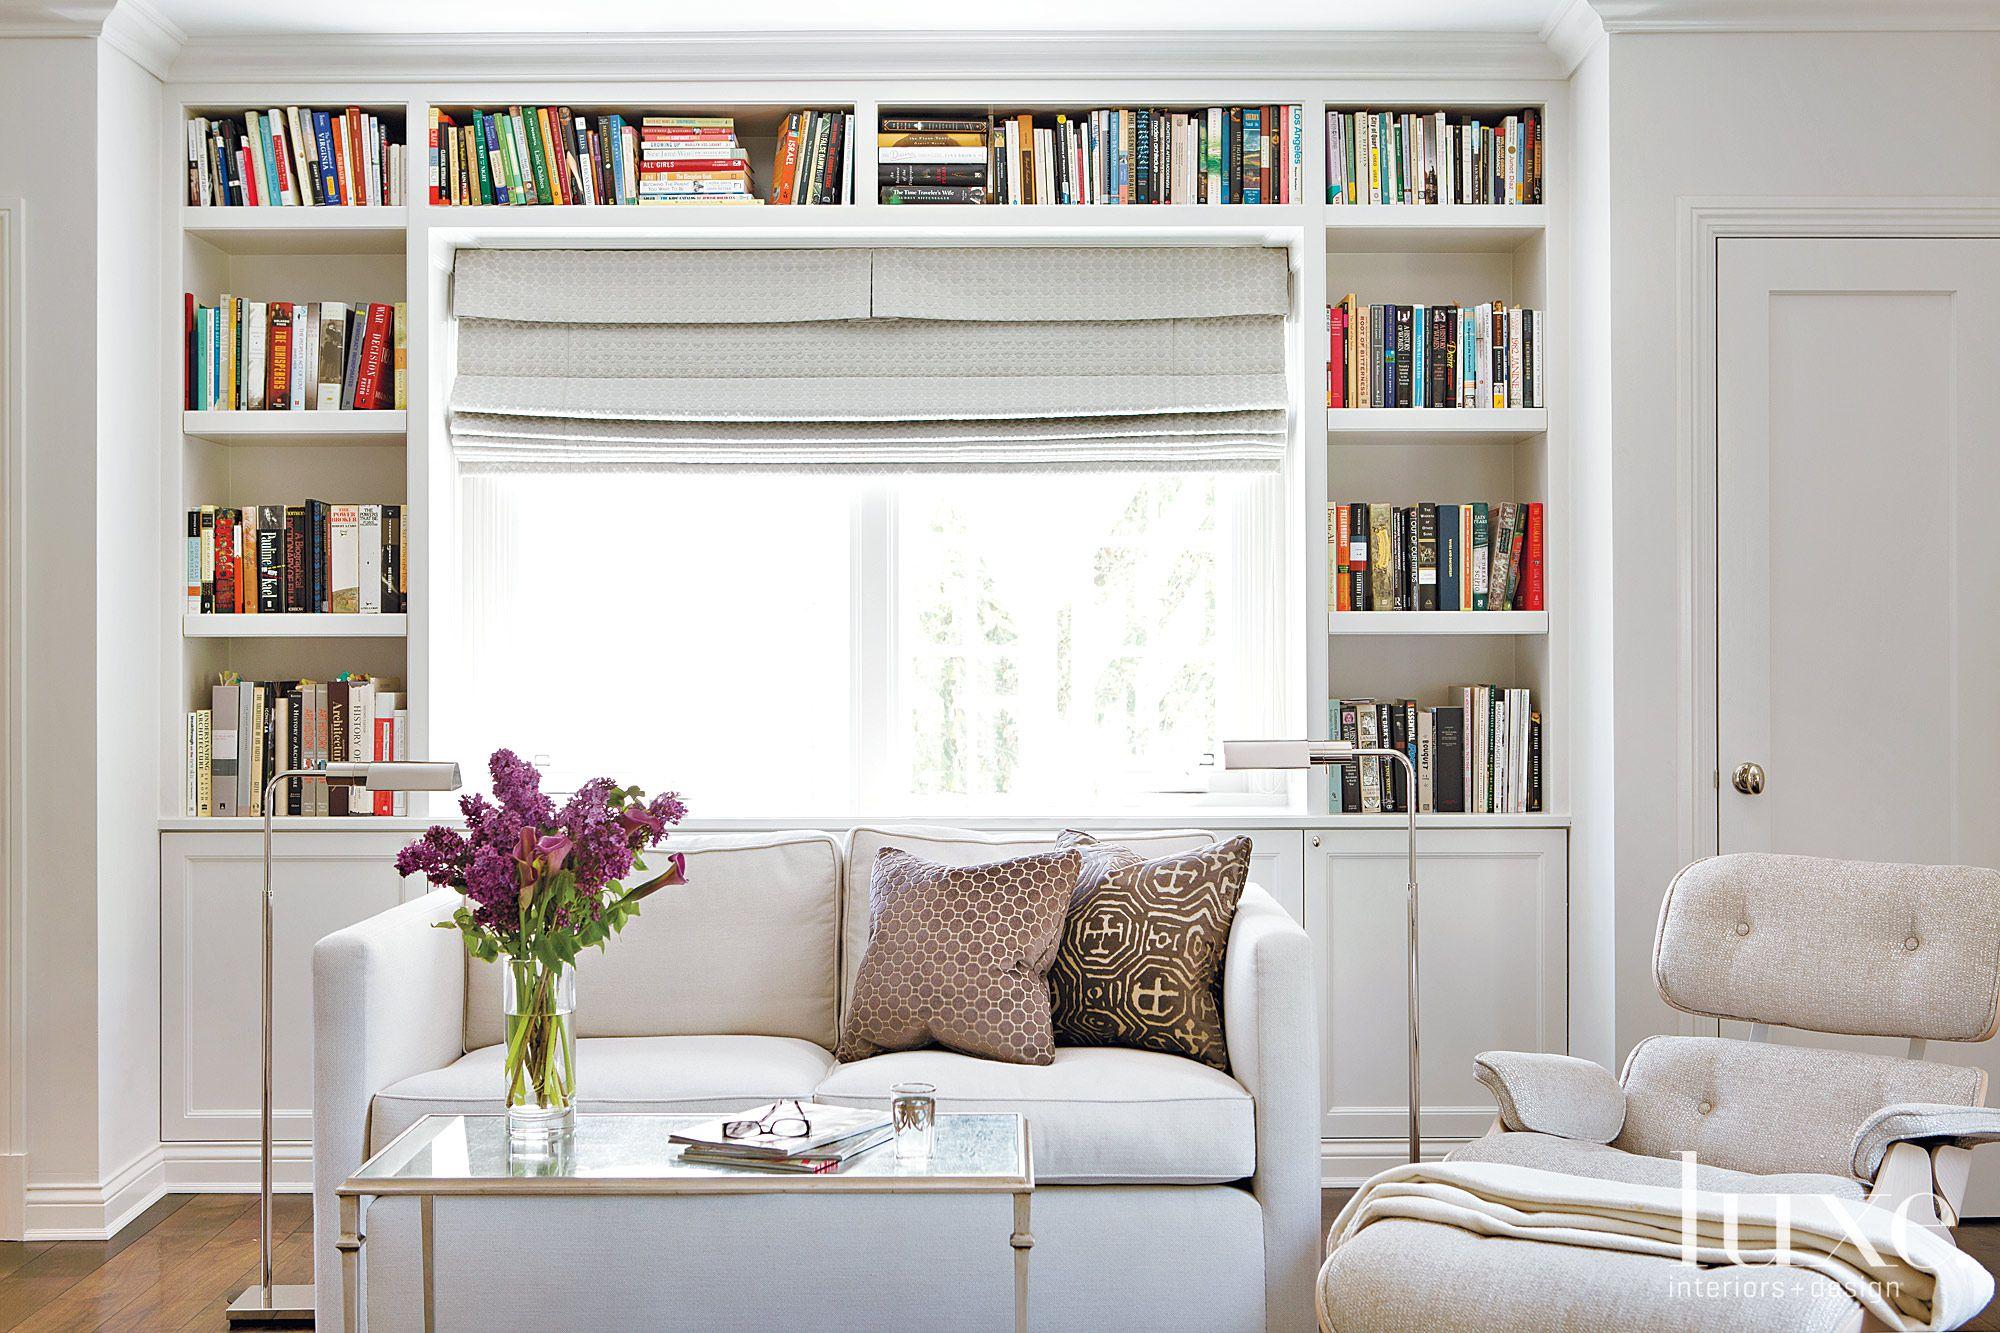 Shelves in master bedroom